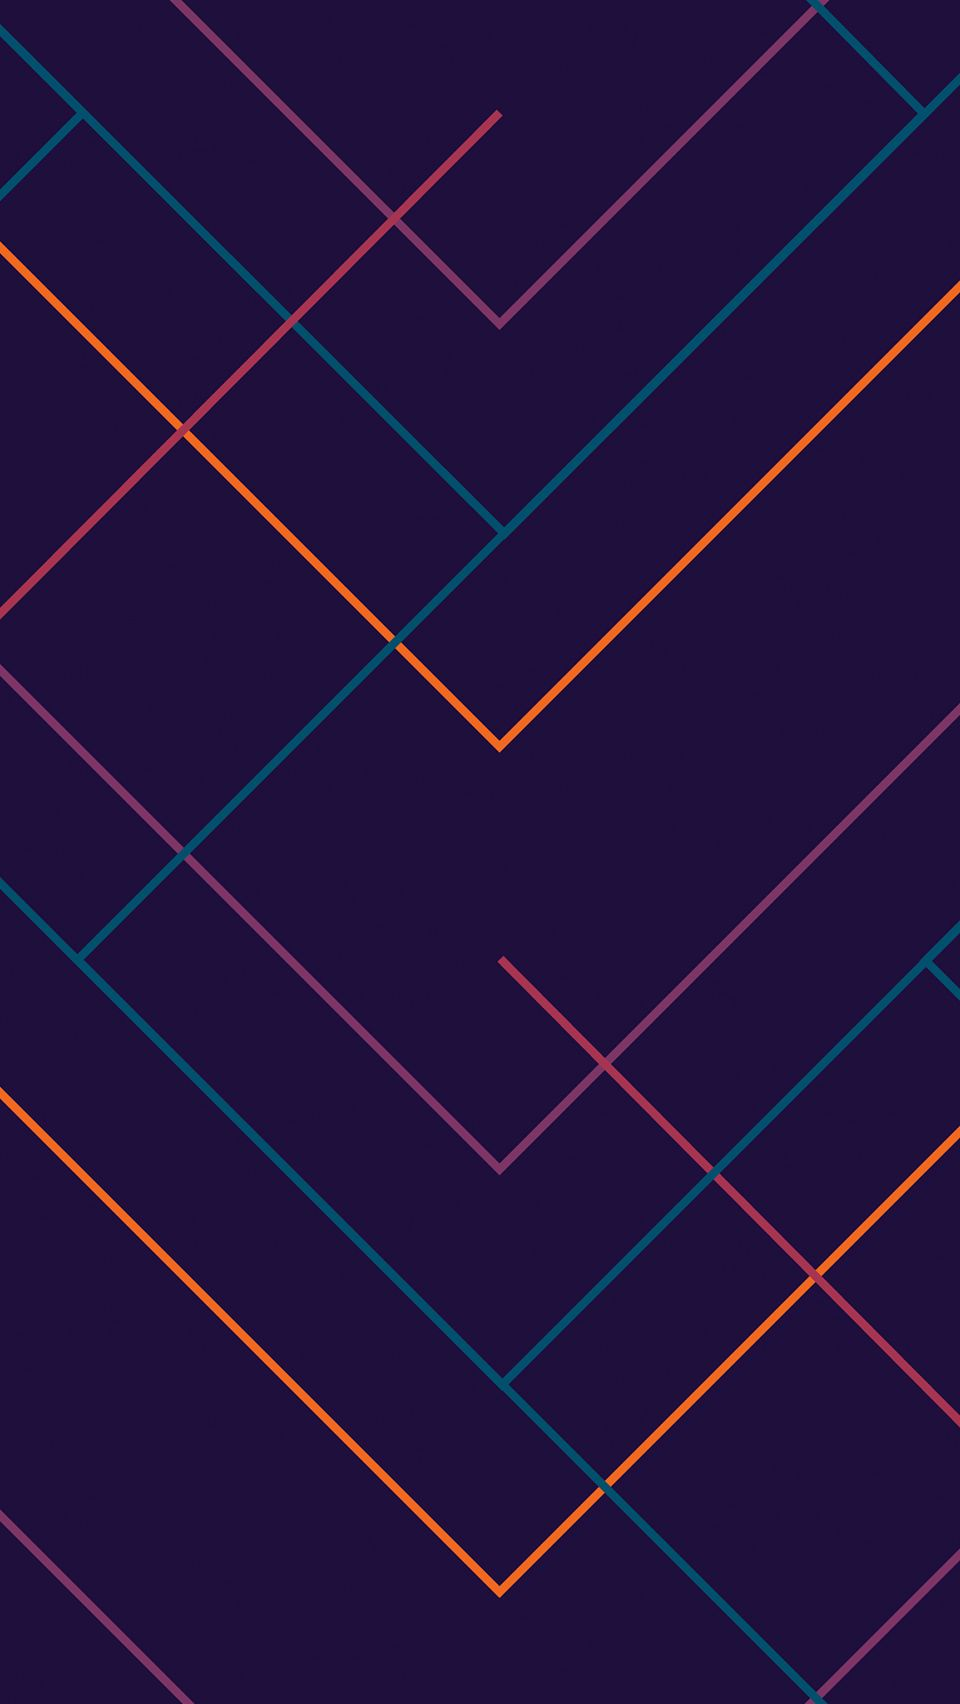 Download 92 Koleksi Wallpaper Simple Paling Keren